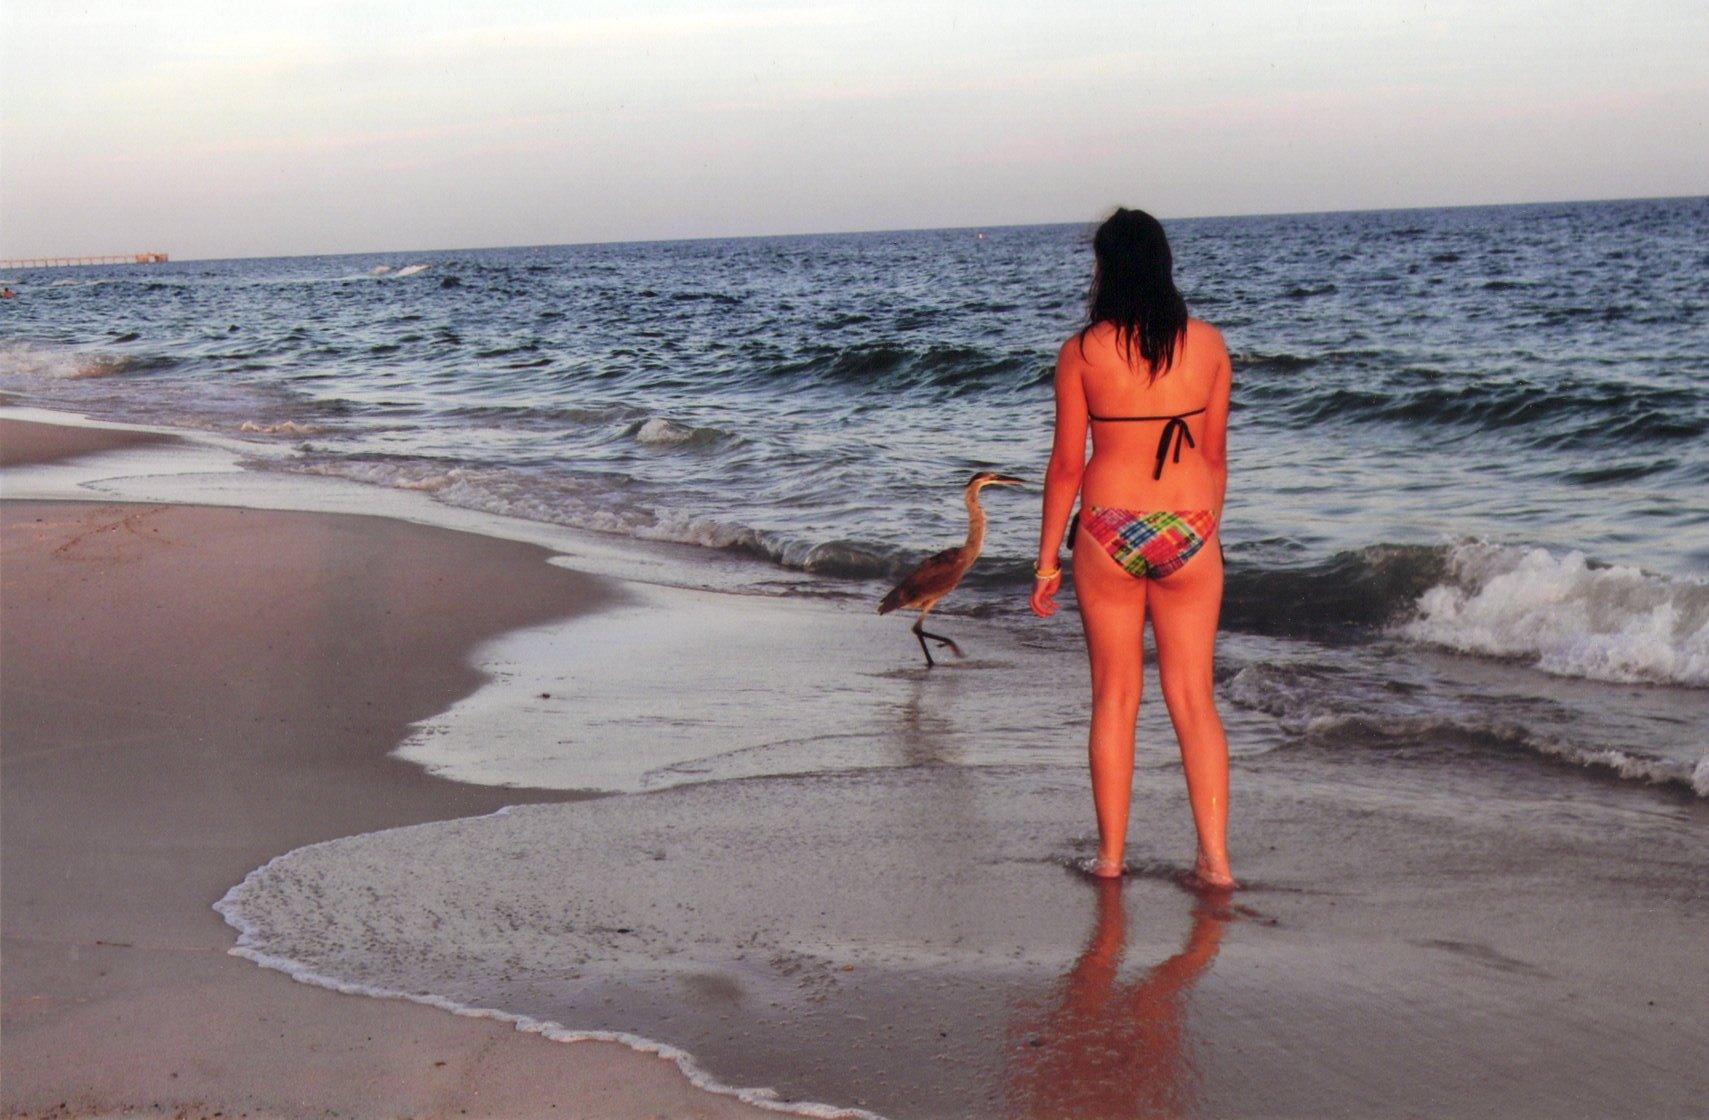 egret www.celeb nudity.com   NEW Nude Celebs, Celebrity Nudes ...